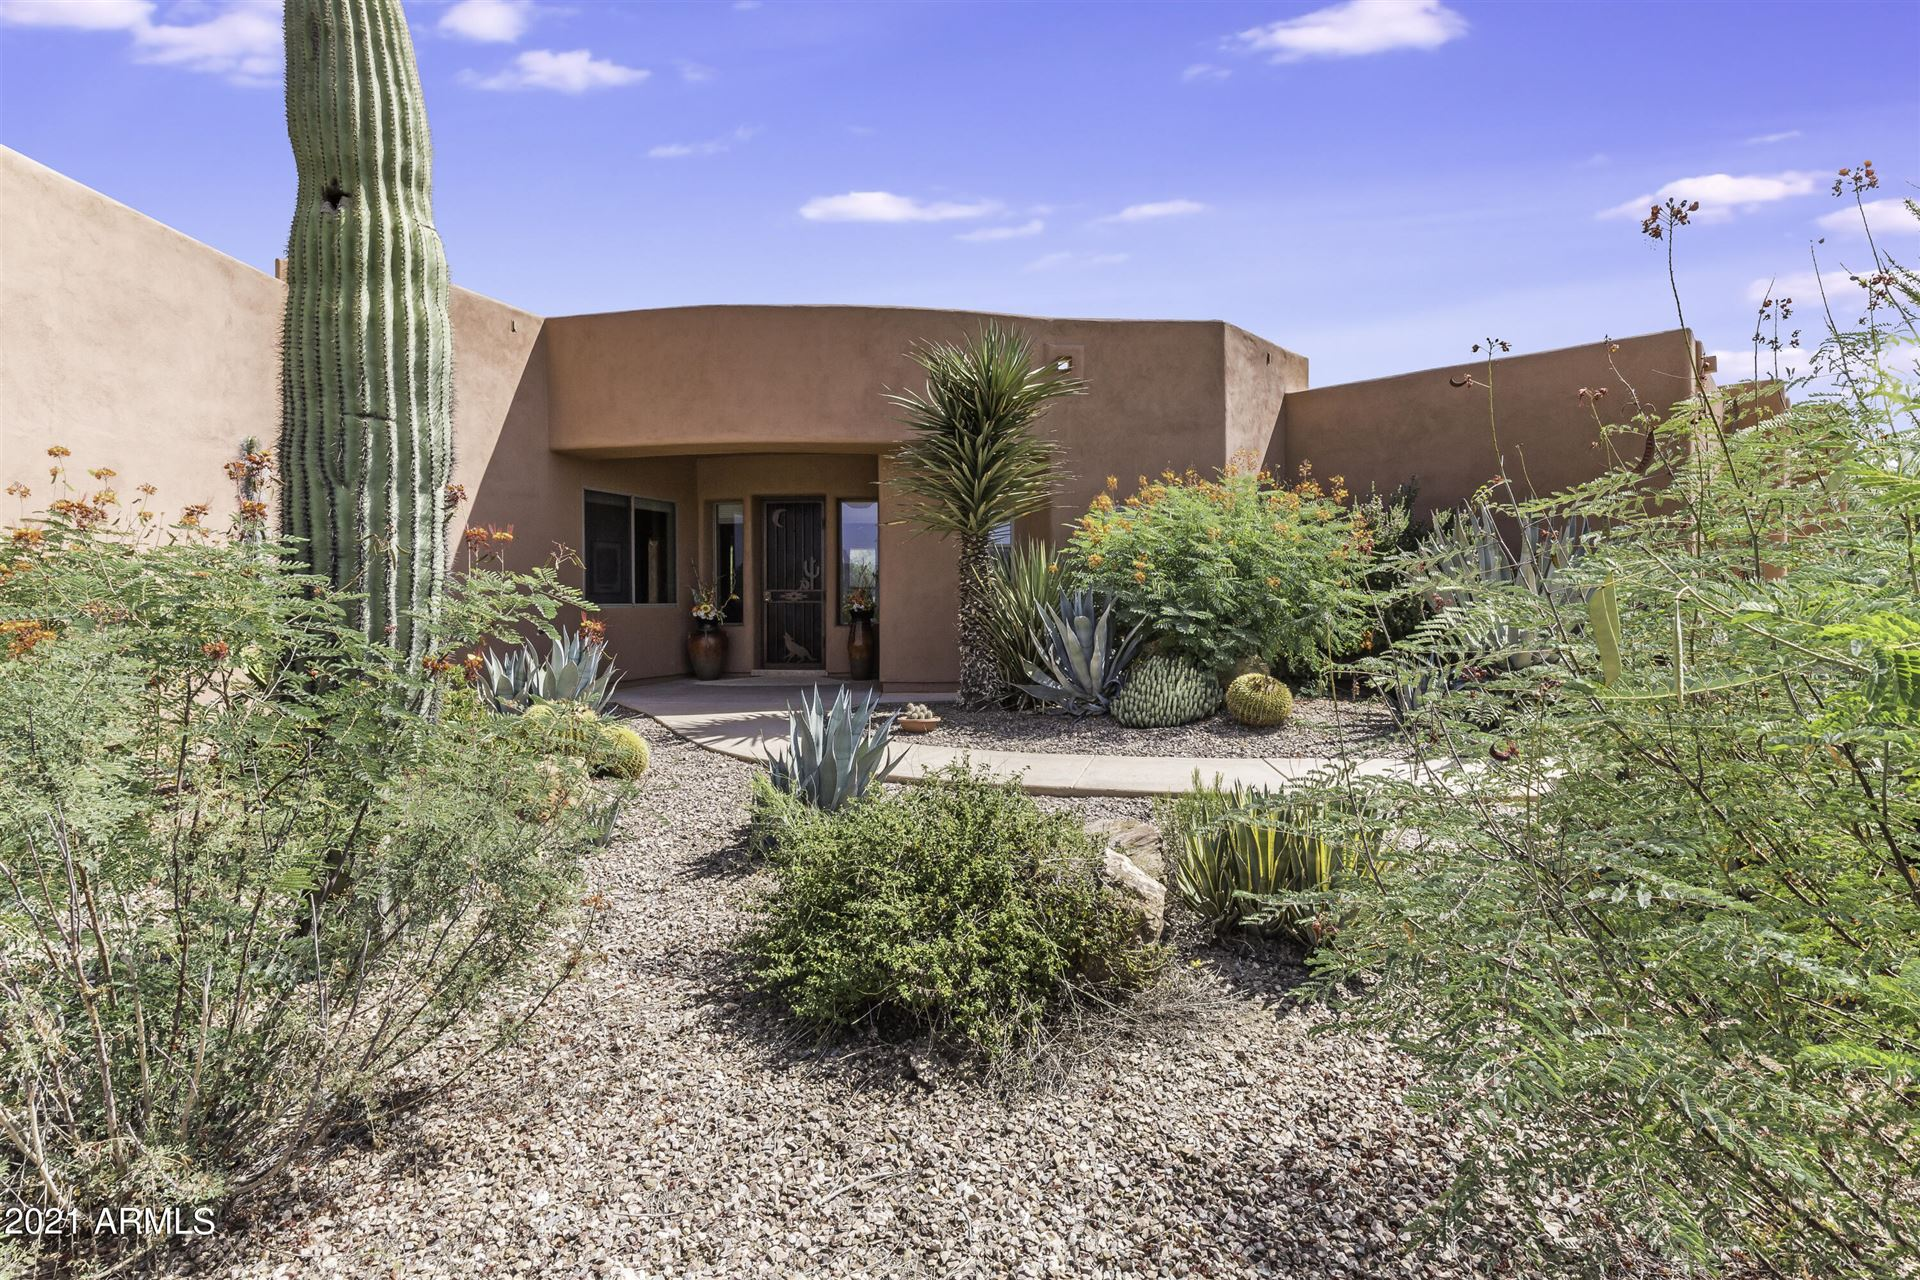 Photo of 44821 N 12th Street, New River, AZ 85087 (MLS # 6281688)